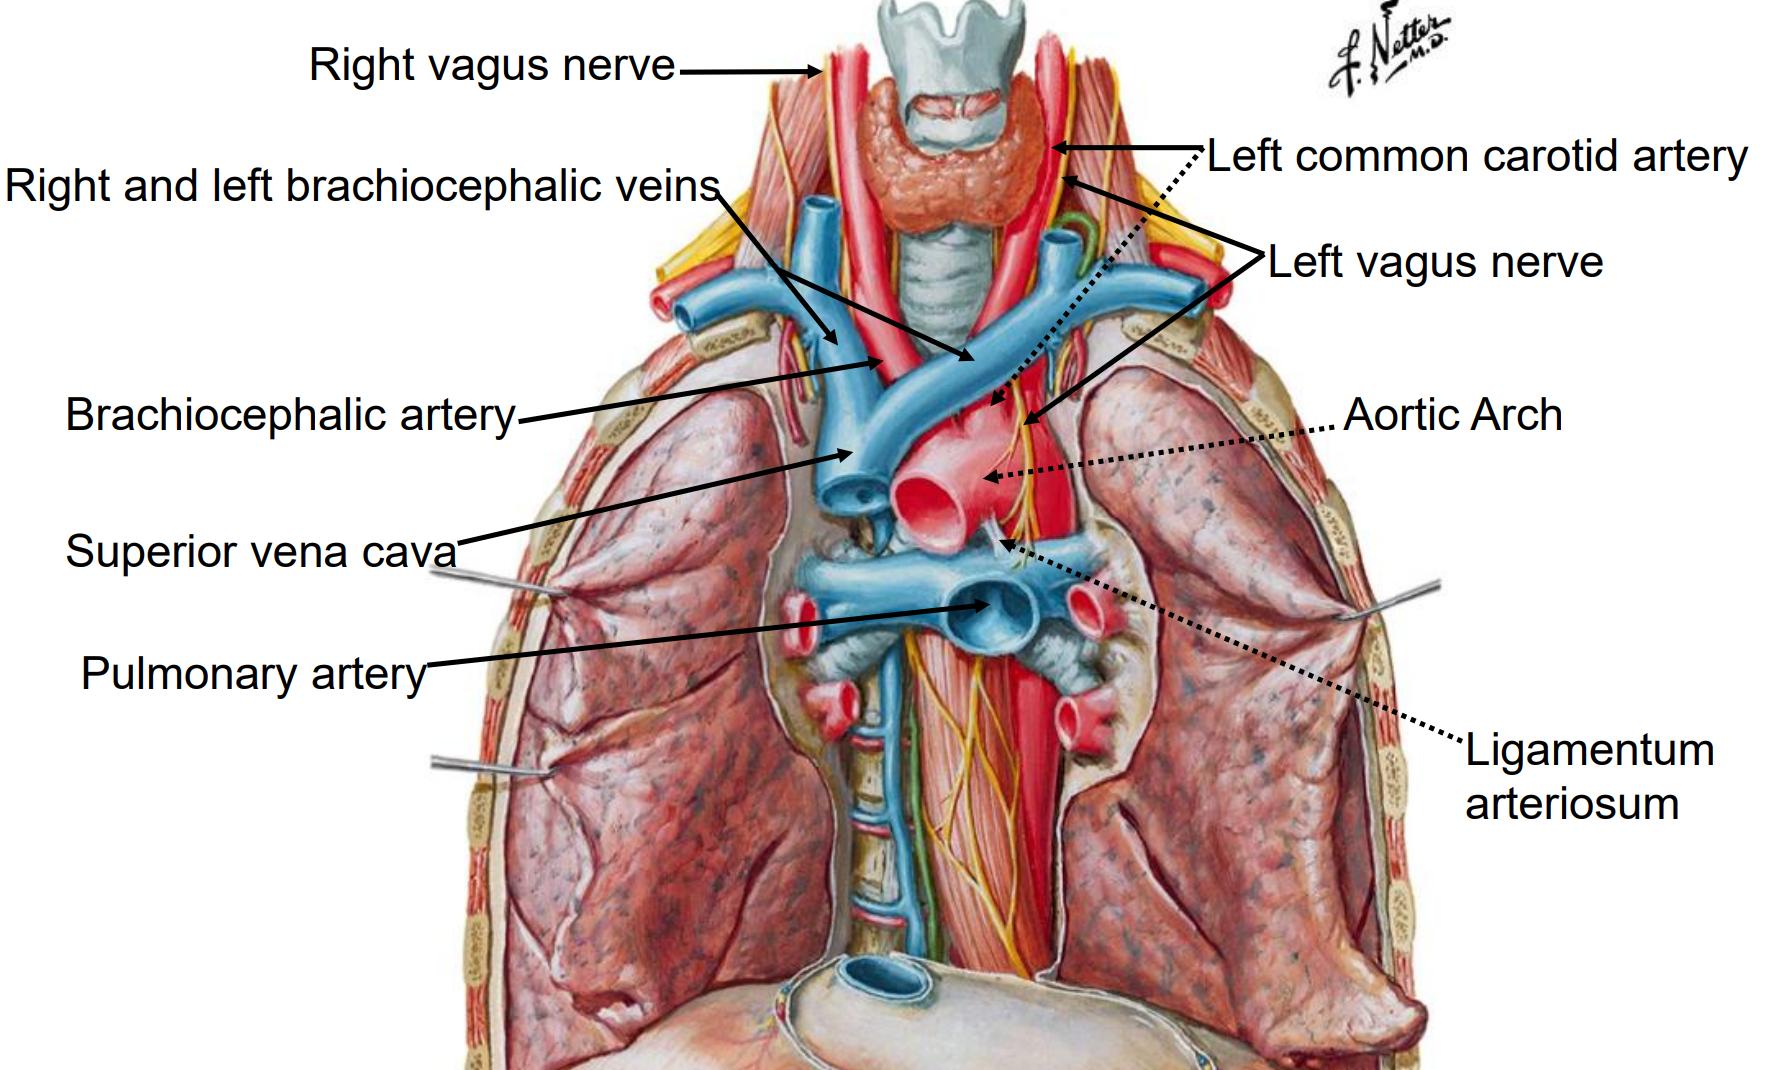 Berühmt Brachiocephalic Arterie Anatomie Galerie - Menschliche ...